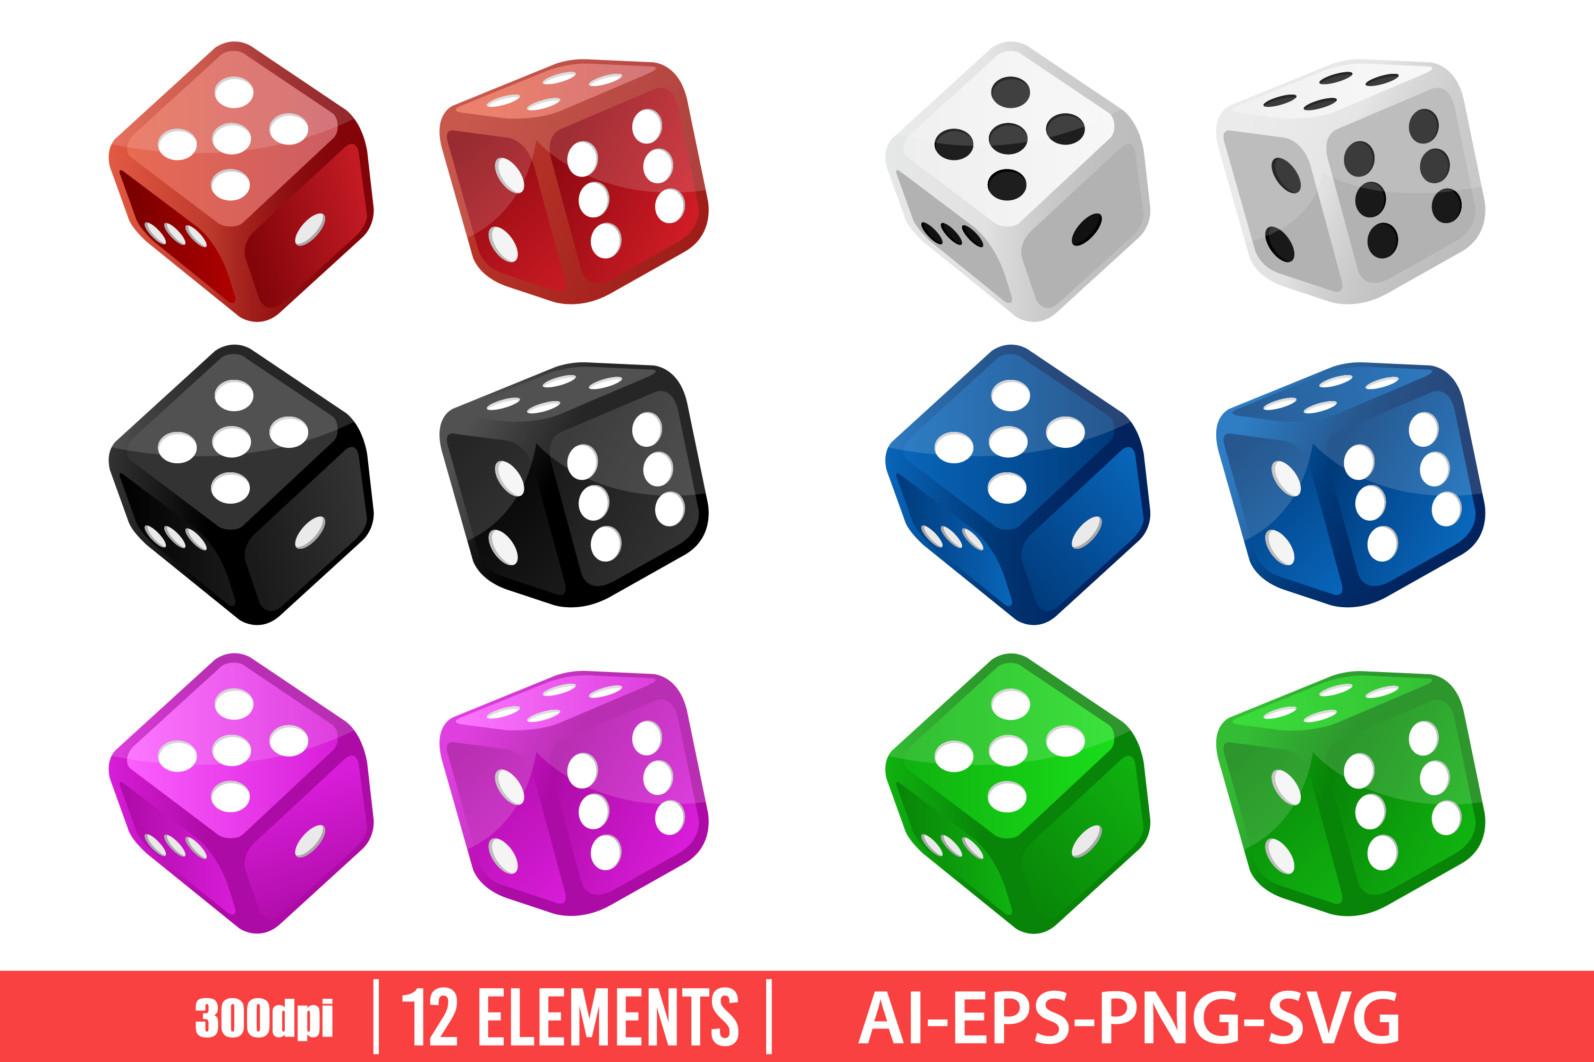 Casino dice clipart vector design illustration. Dice set. Vector Clipart Print - DICE scaled -